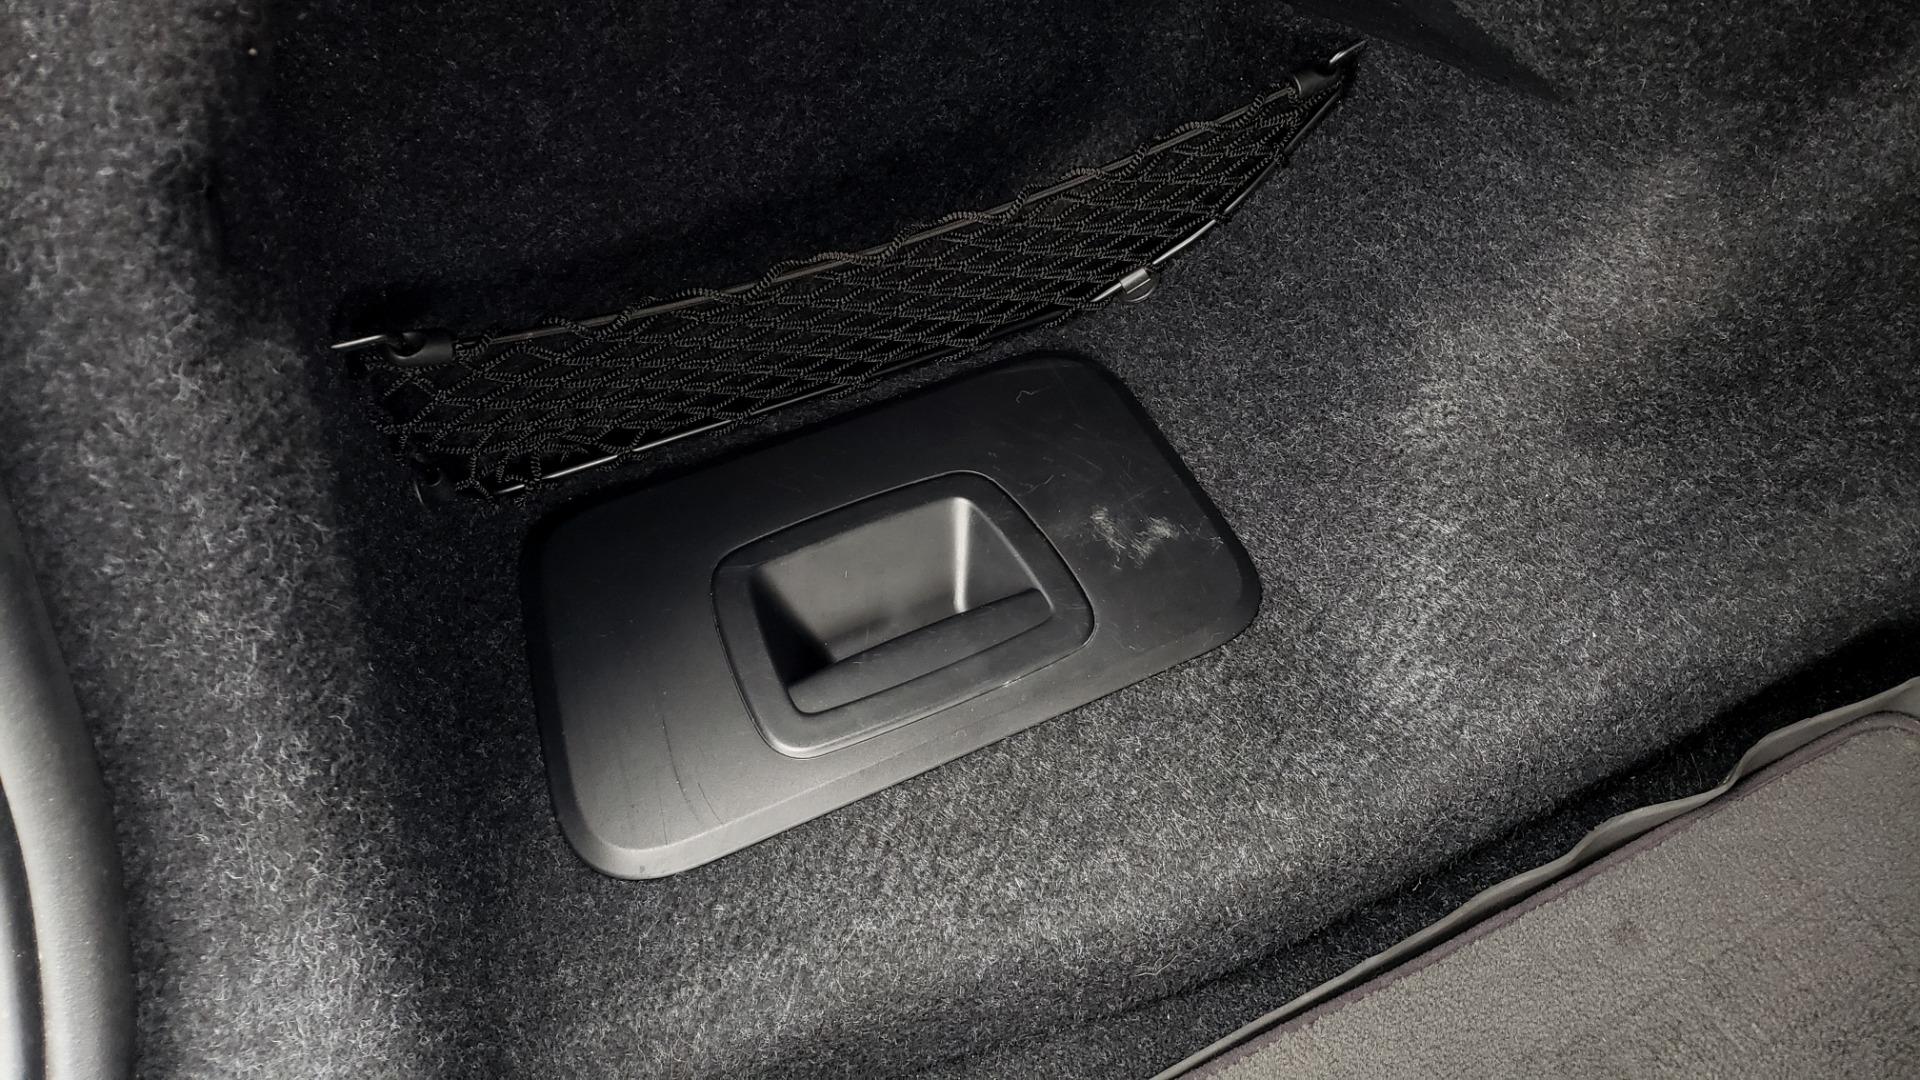 Used 2017 BMW 5 SERIES 530IXDRIVE / PREM PKG / DRVR ASST PLUS / CLD WTHR / APPLE CARPLAY for sale Sold at Formula Imports in Charlotte NC 28227 14